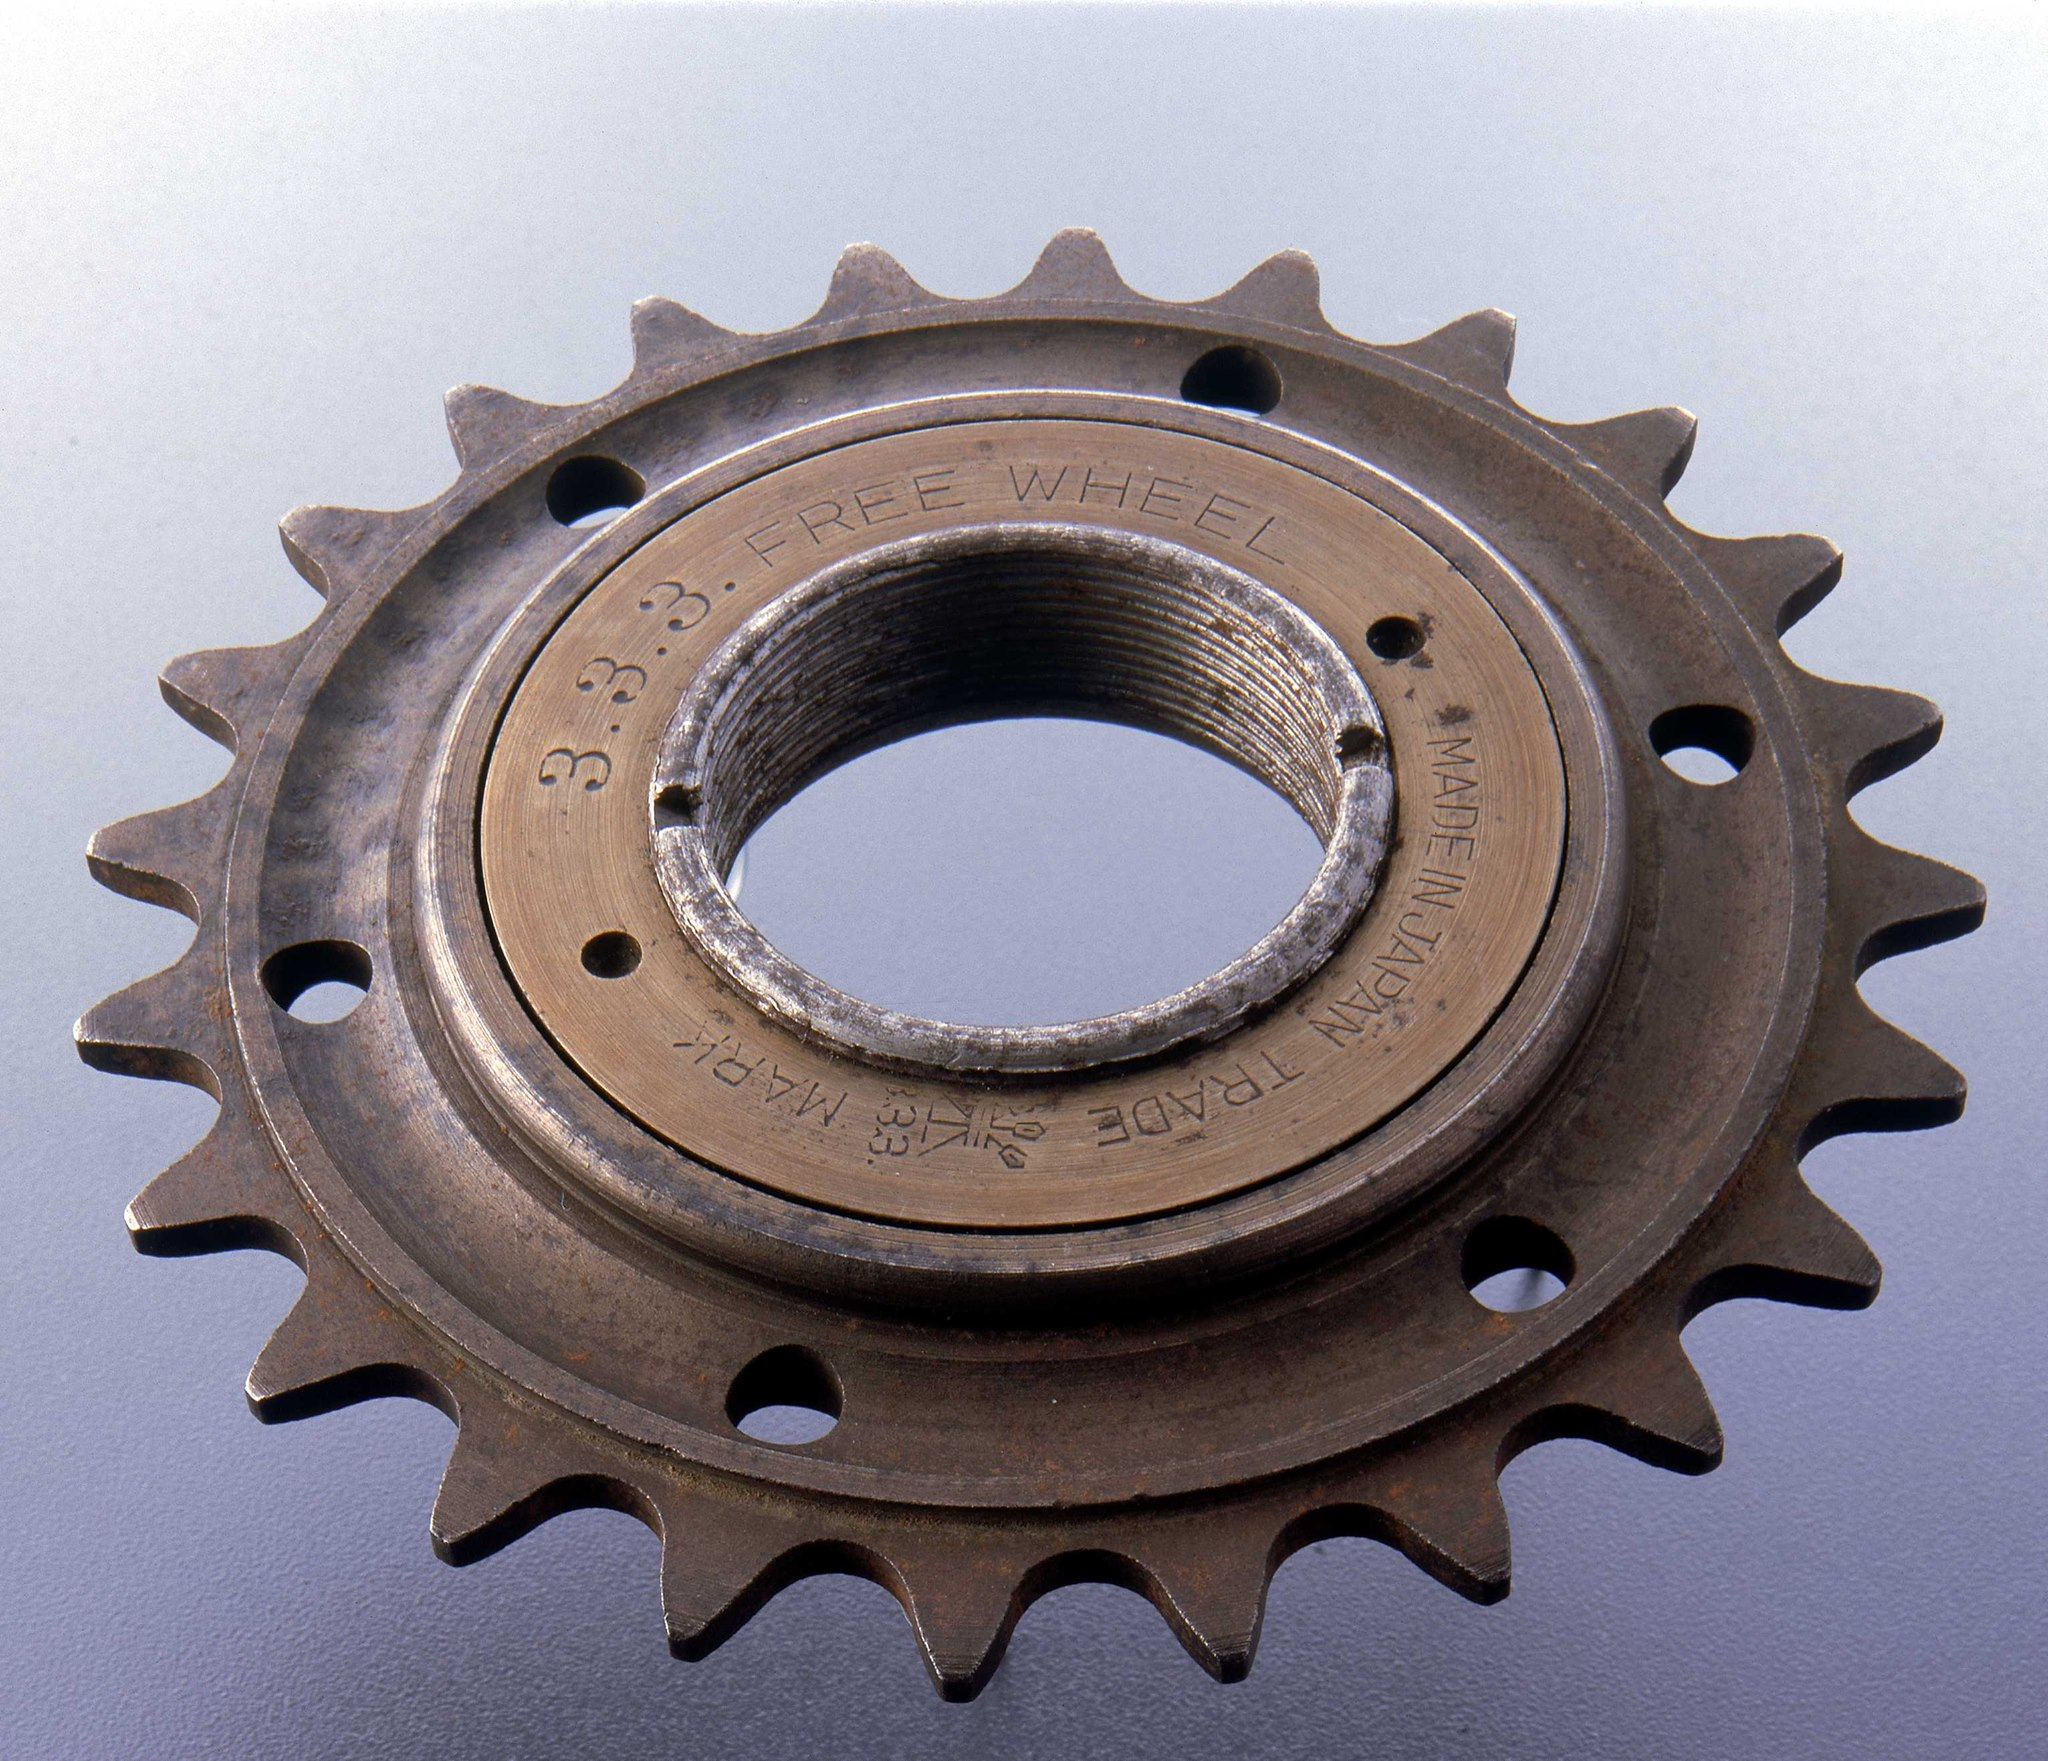 the first shimano freewheel